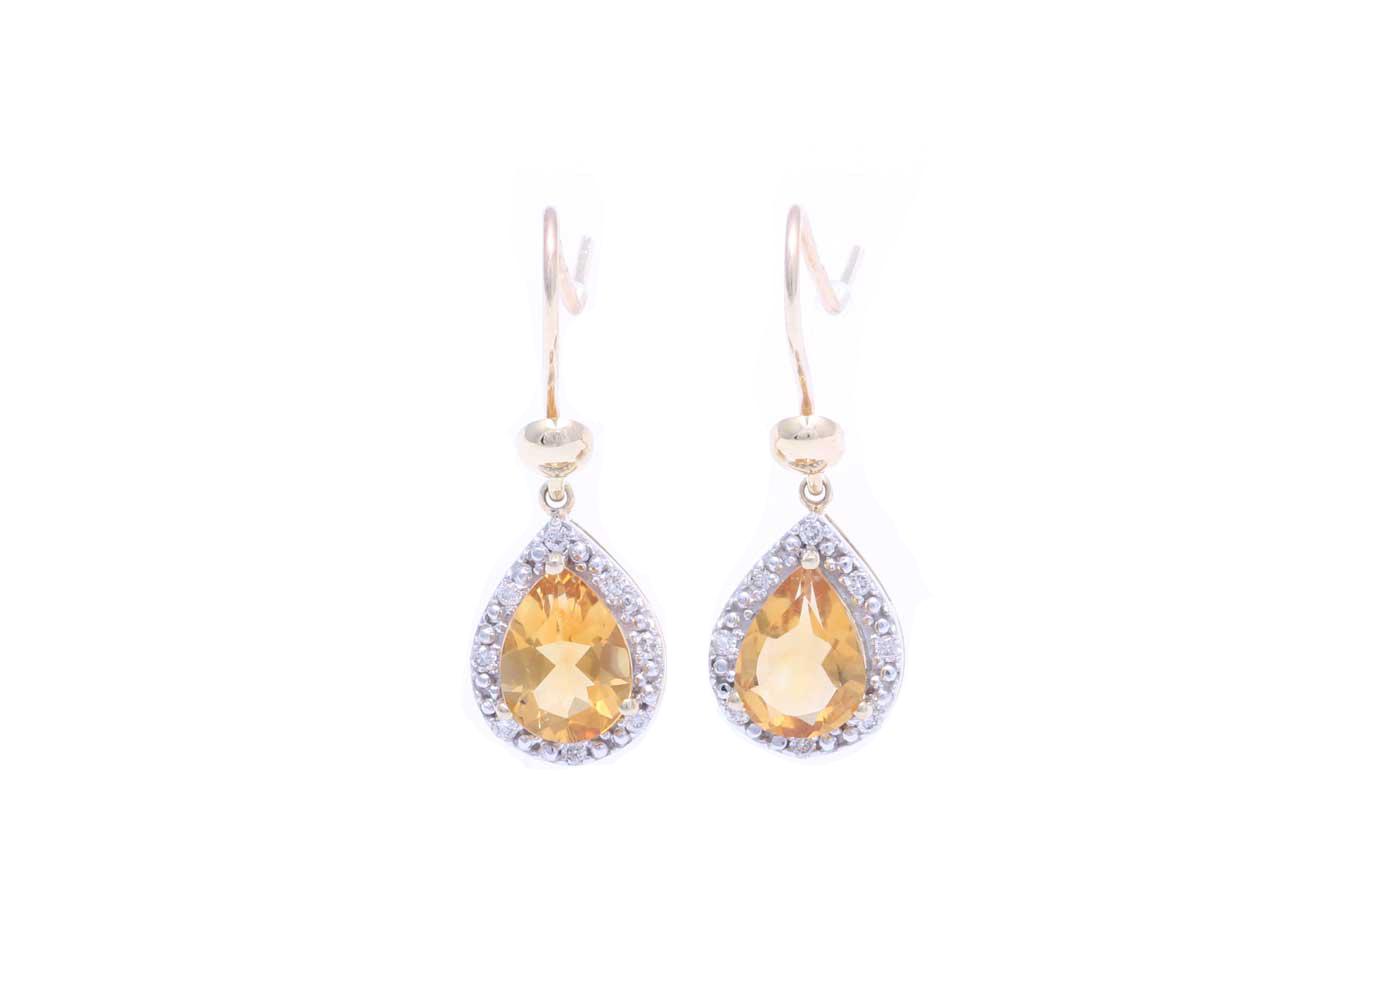 Lot 41 - 9ct Yellow Gold Citrine Diamond Earring 0.13 Carats